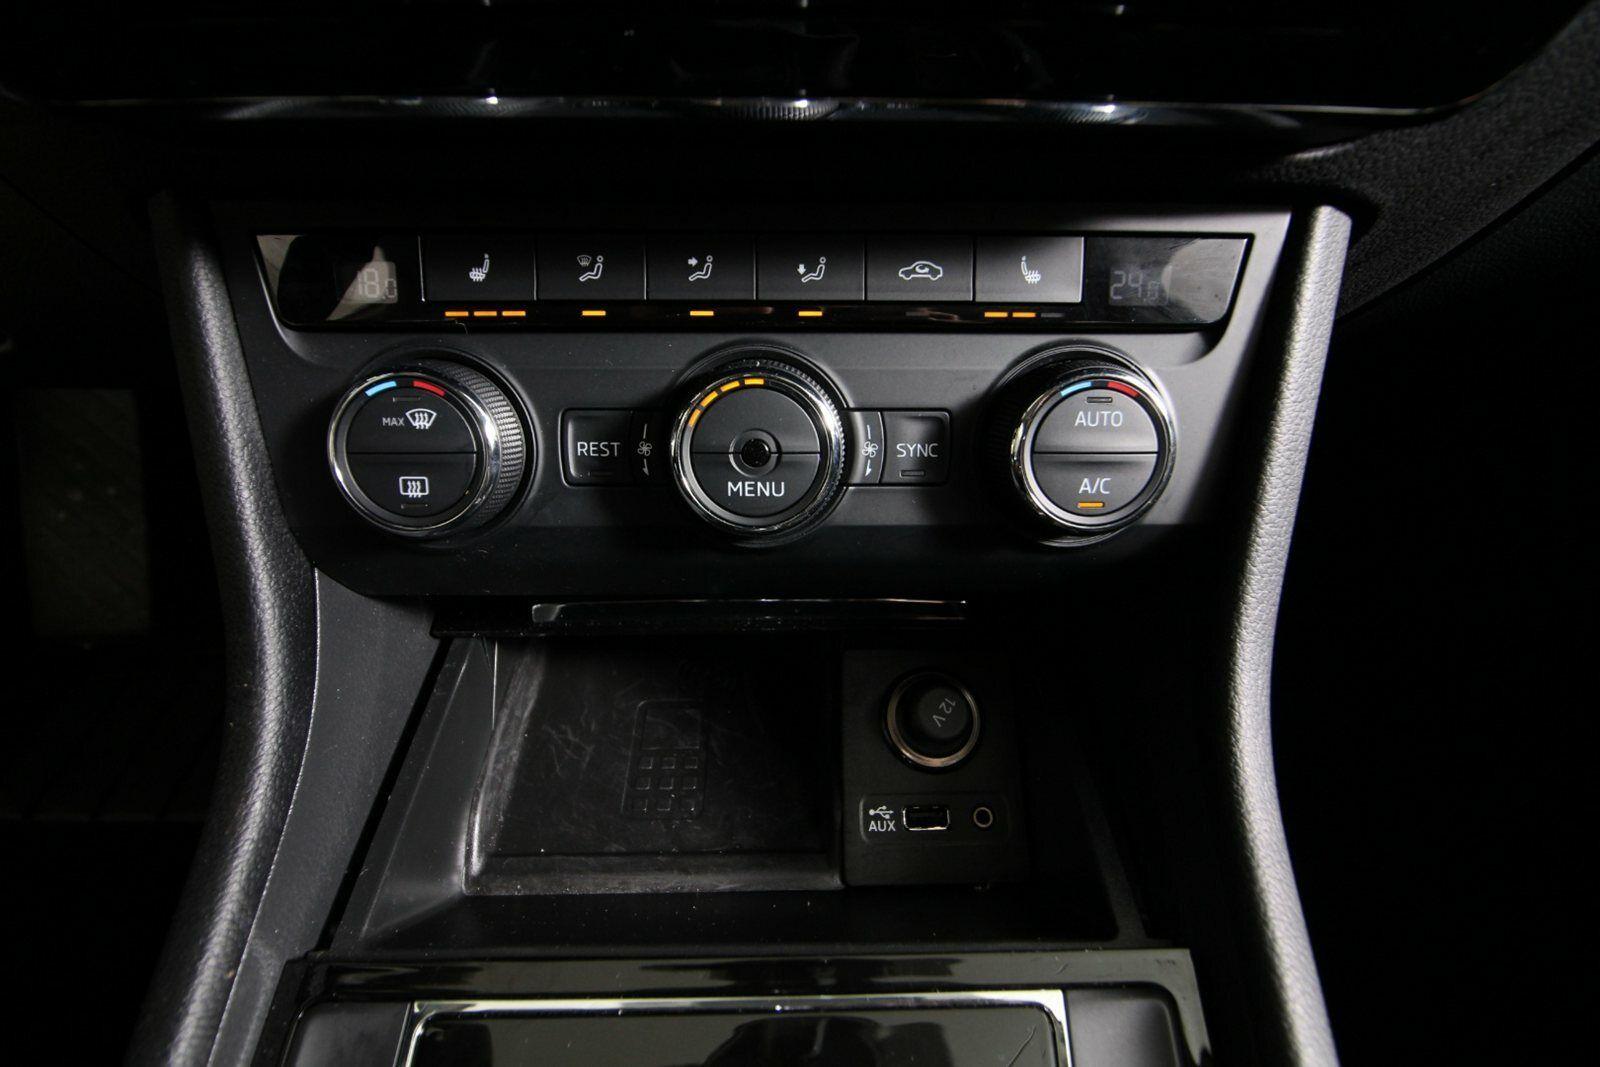 Skoda Superb TDi 190 Style Combi DSG